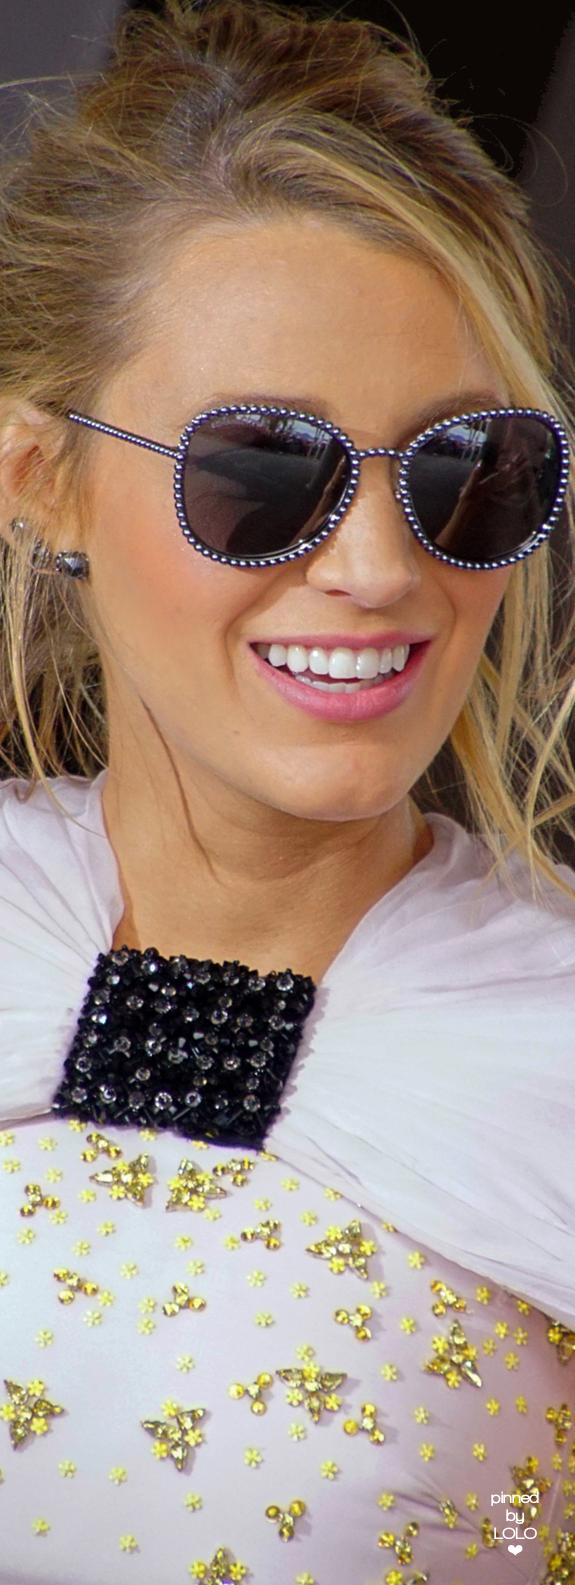 Blake Lively | | LOLO ︎ | Blake lively style, Celebrity ...